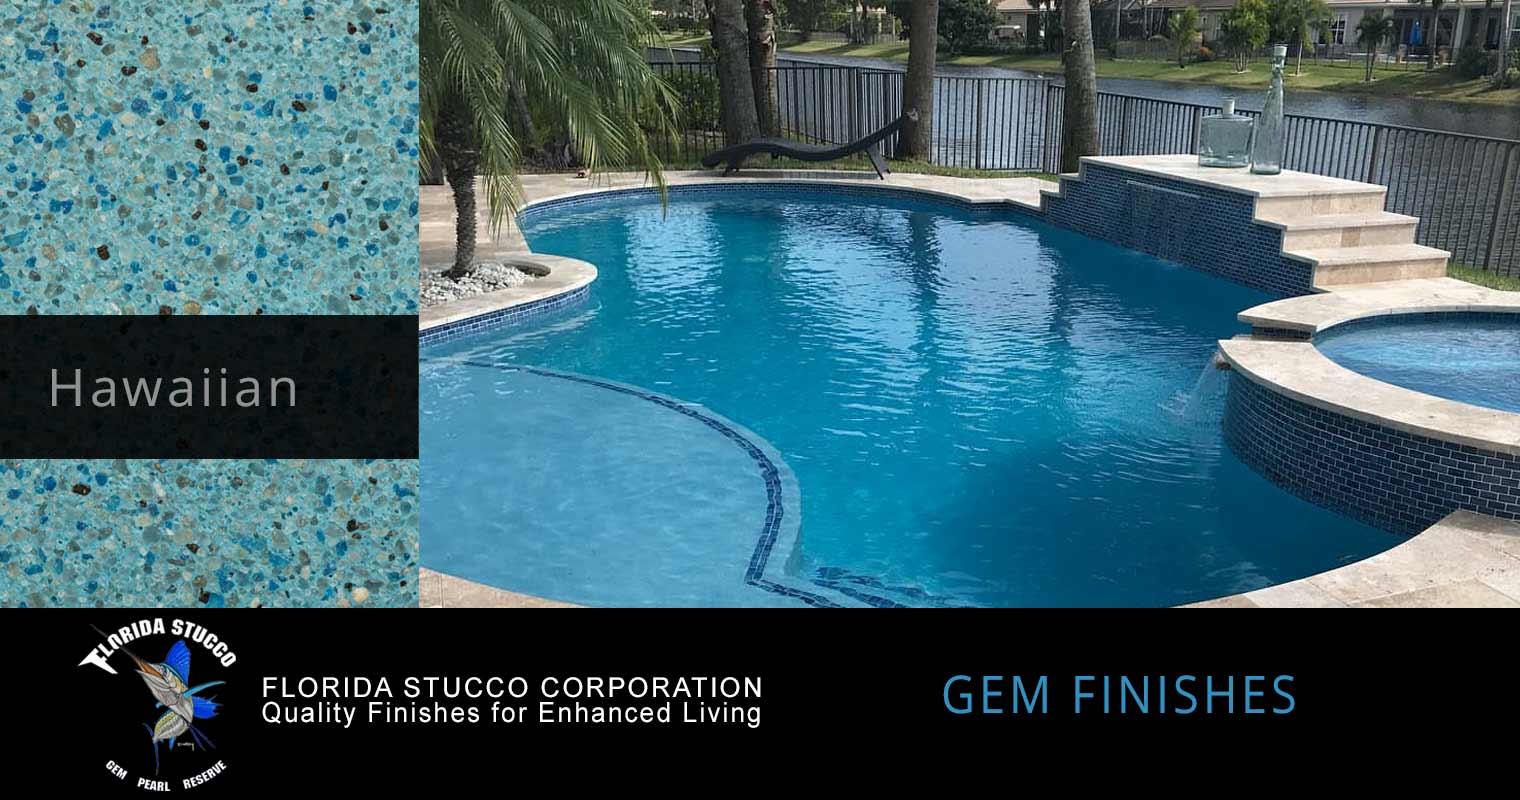 Florida Stucco - Hawaiian Plastering Finish Pool Sample 2